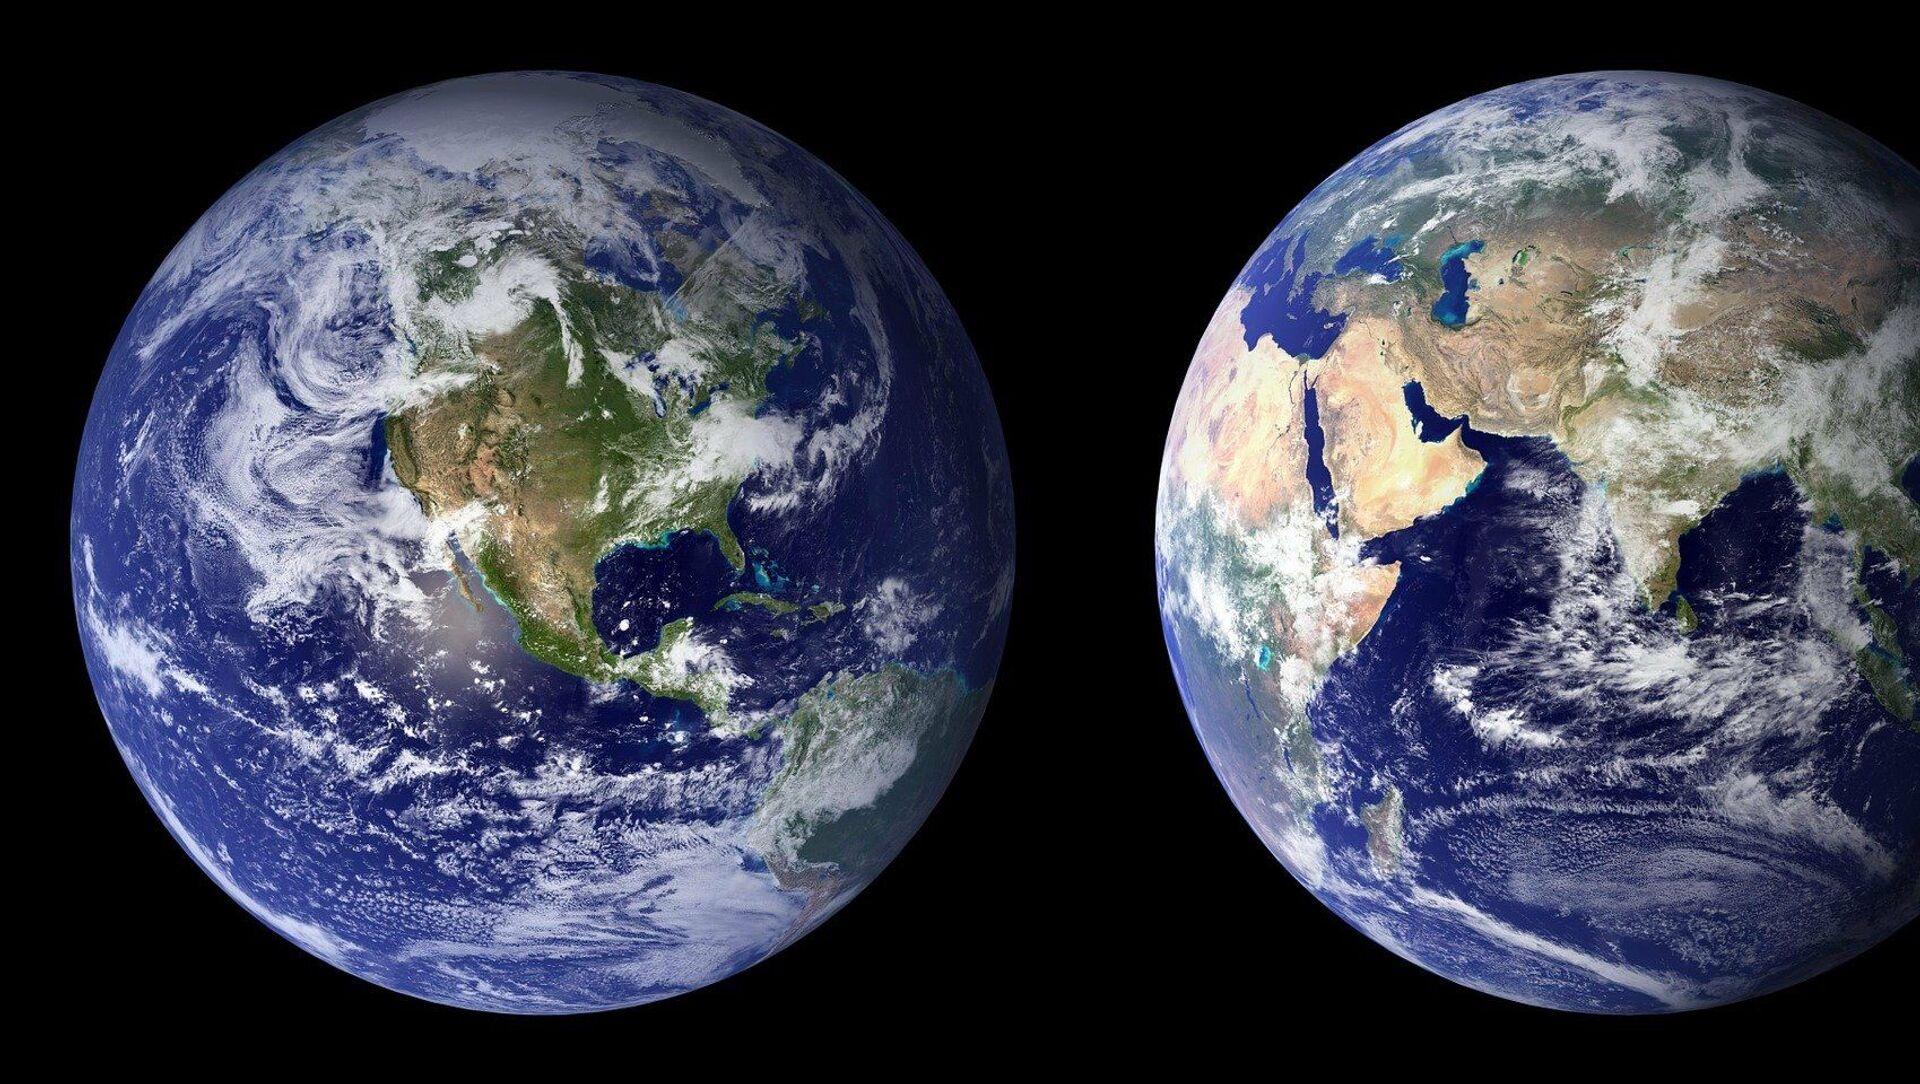 El planeta Tierra, referencial - Sputnik Mundo, 1920, 10.02.2021